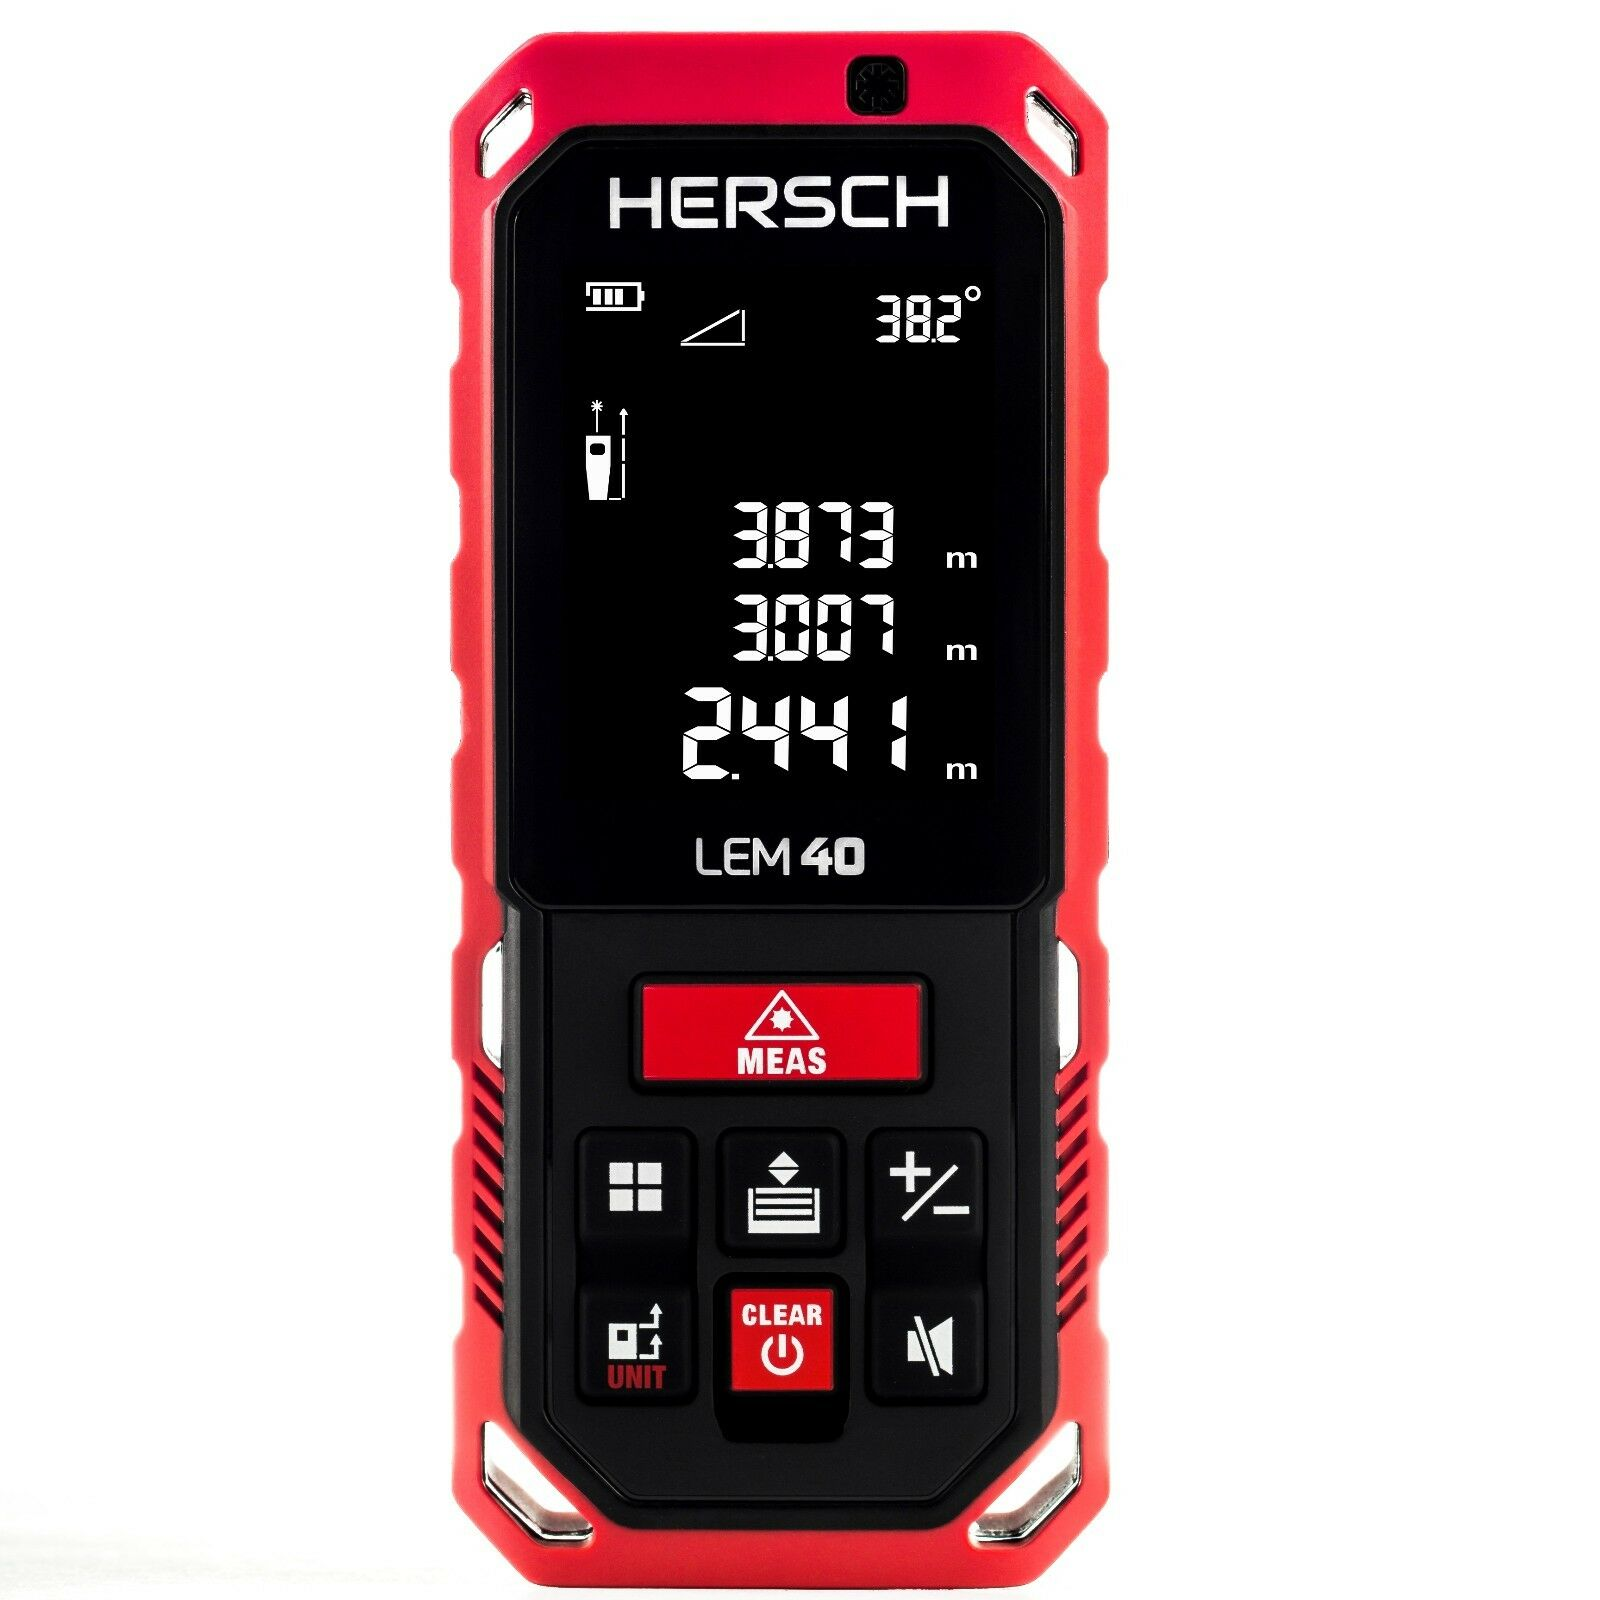 HERSCH Laser Entfernungsmesser LEM 40 mit Neigungssensor,Ni-MH 800mAh Akkus,IP65